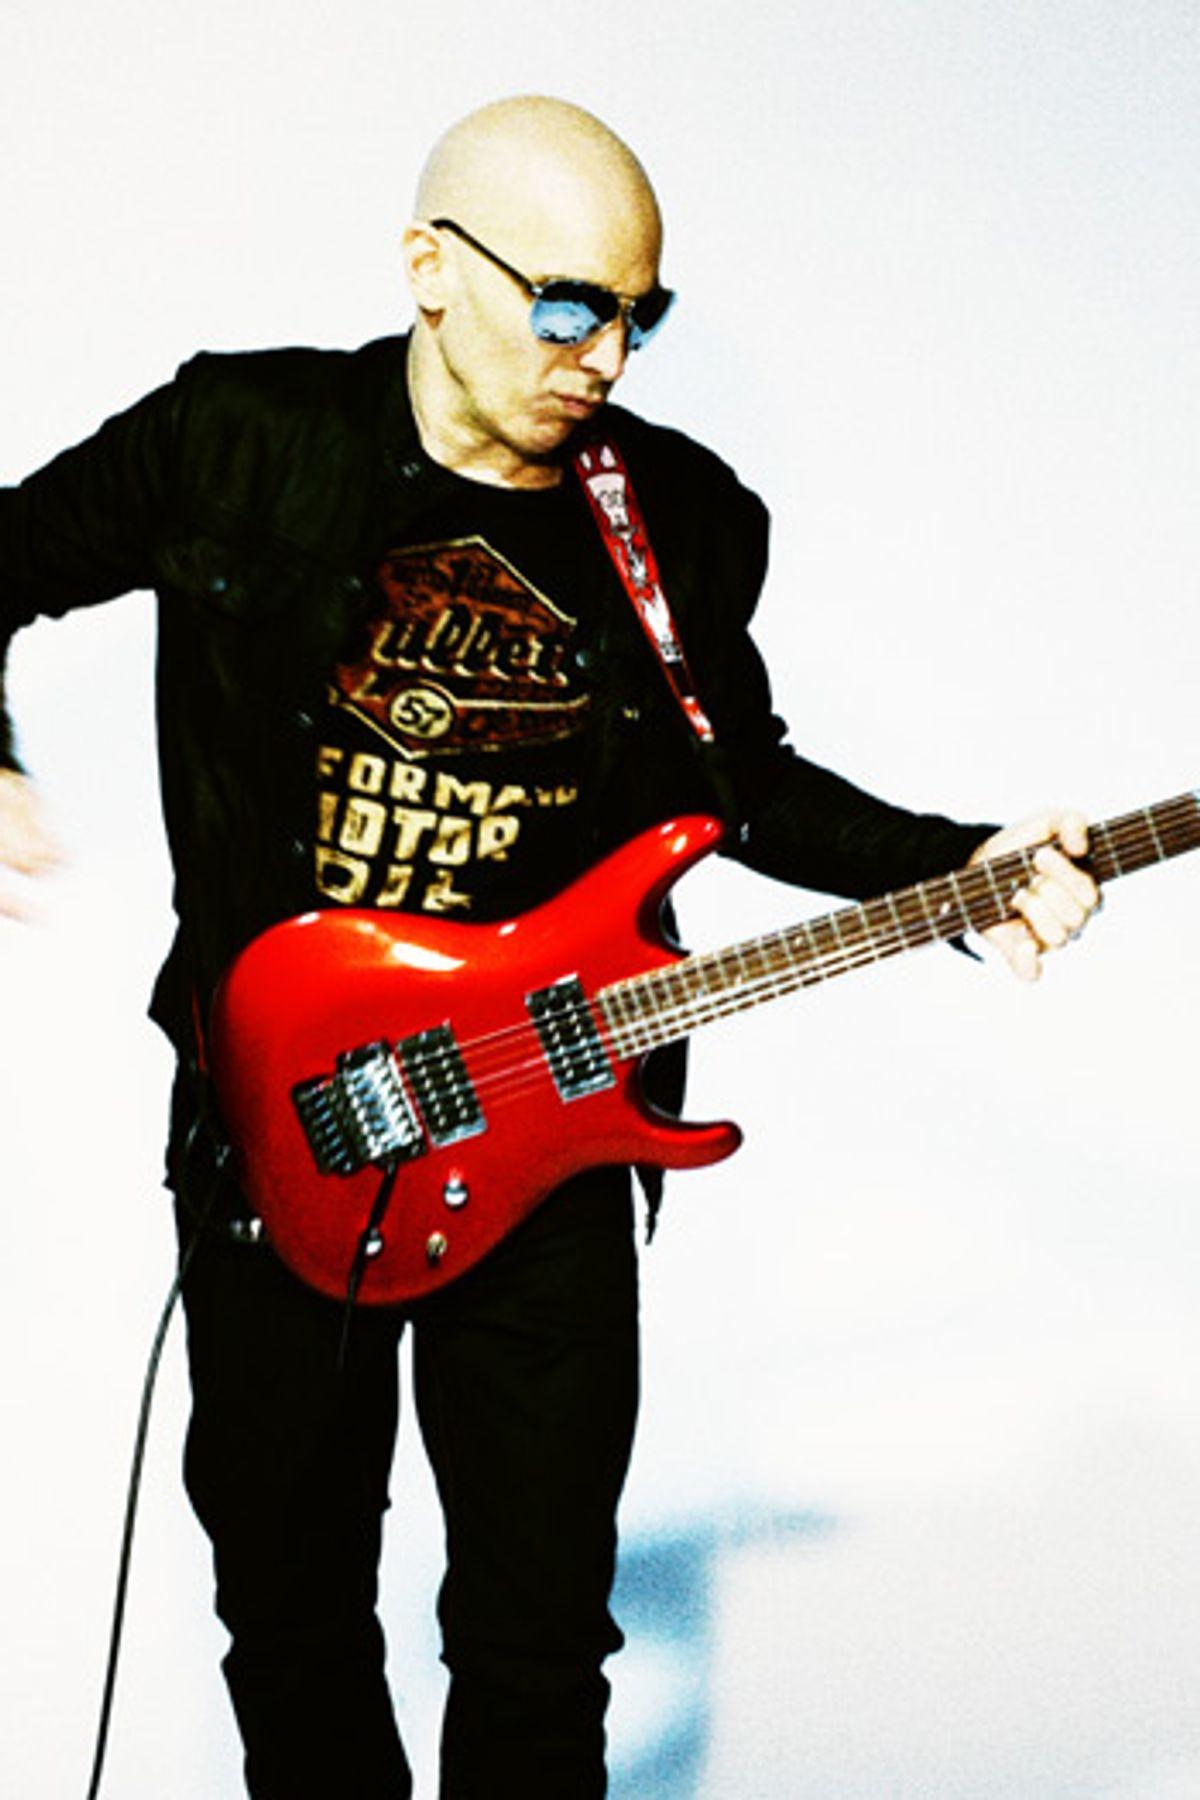 Interview: Joe Satriani - Into the Wormhole